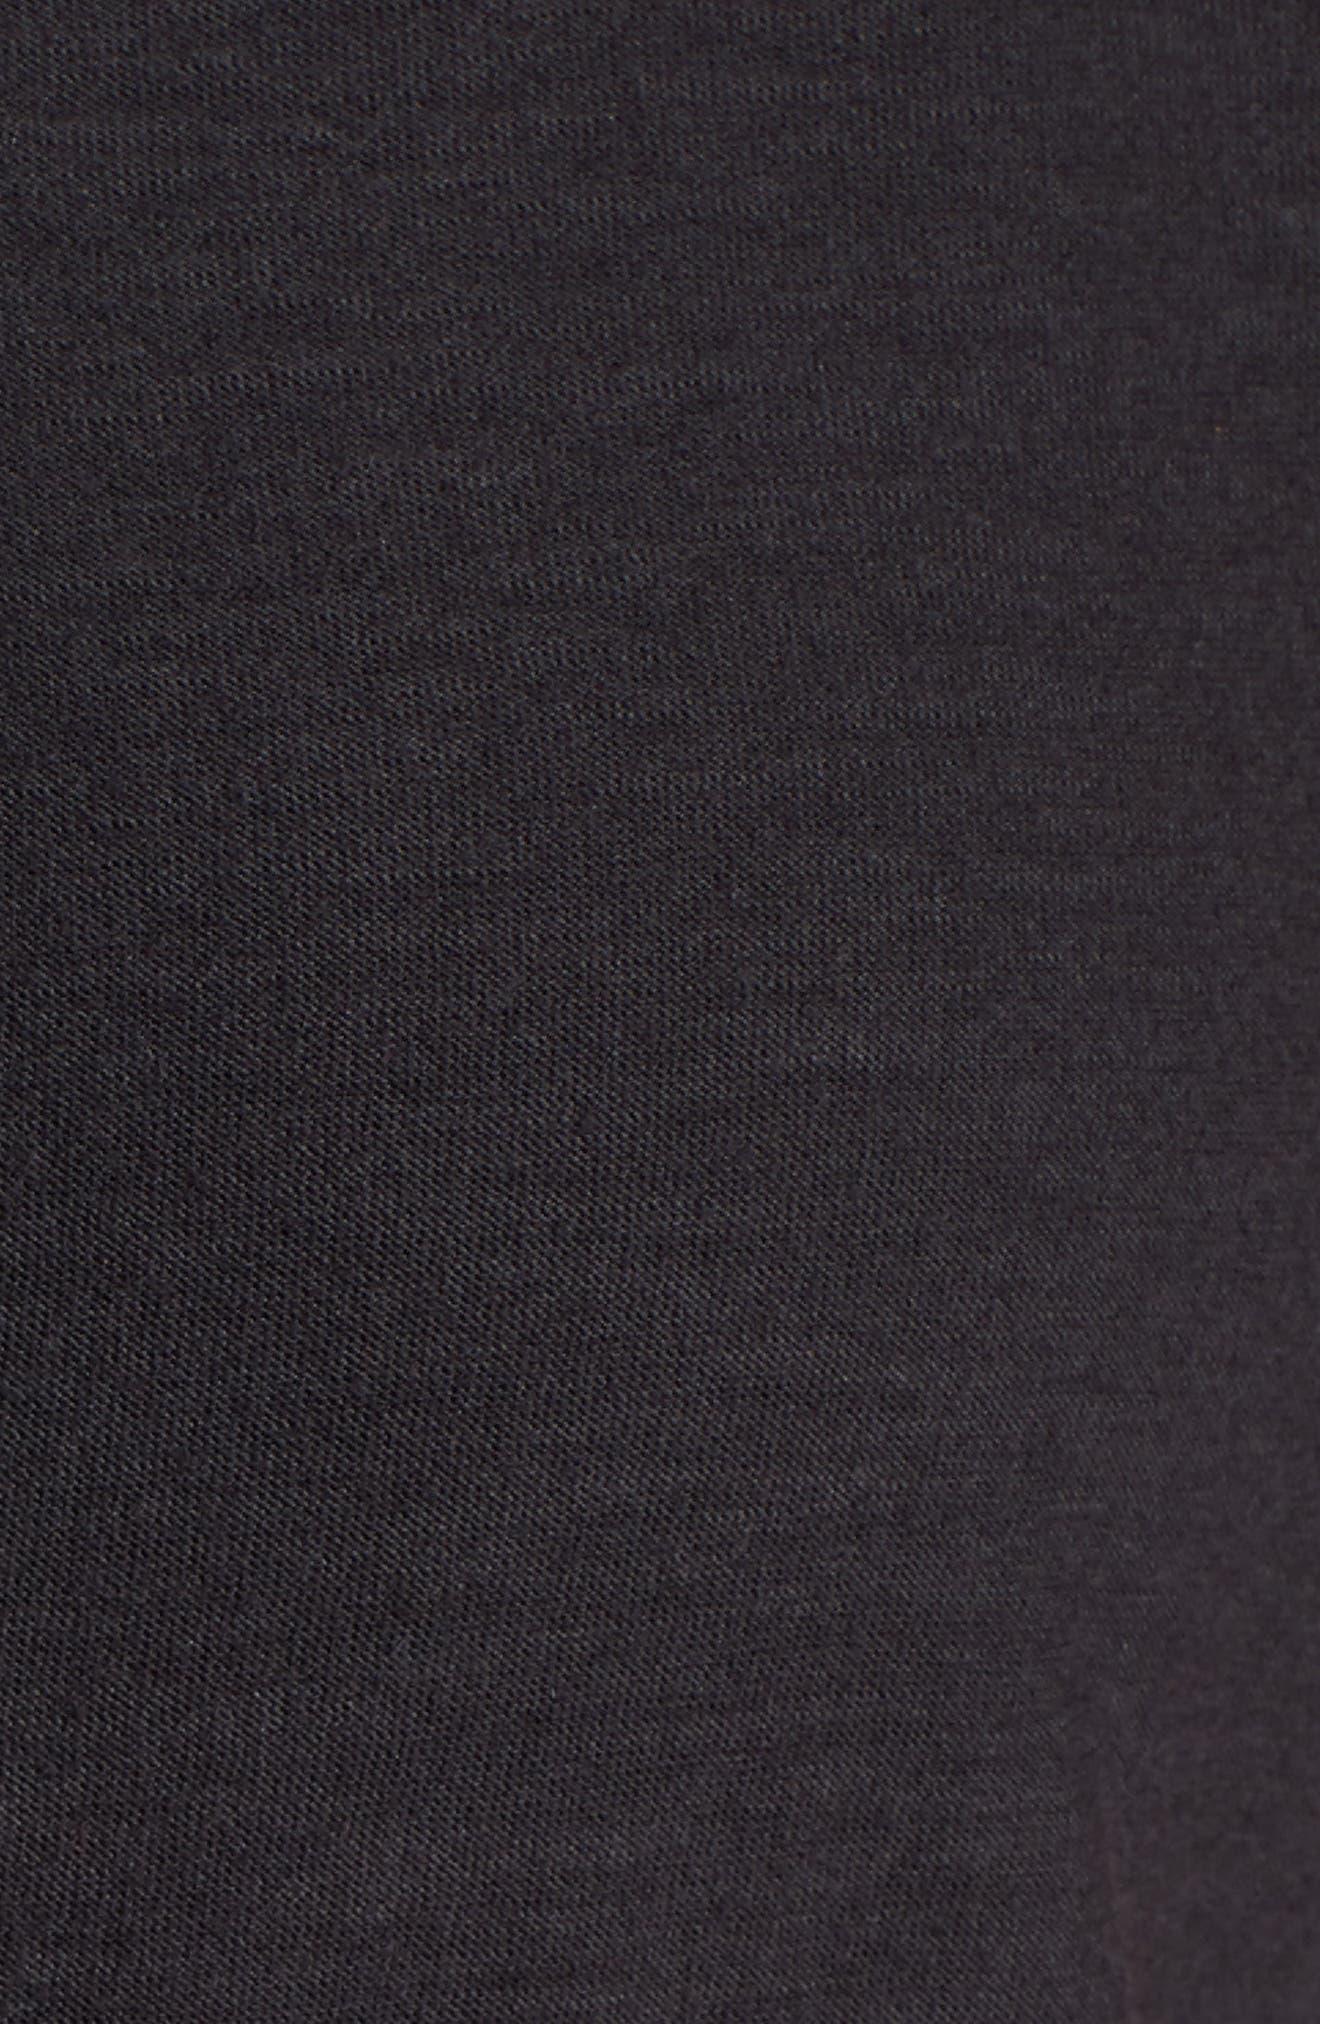 Arden Shift Dress,                             Alternate thumbnail 5, color,                             Black